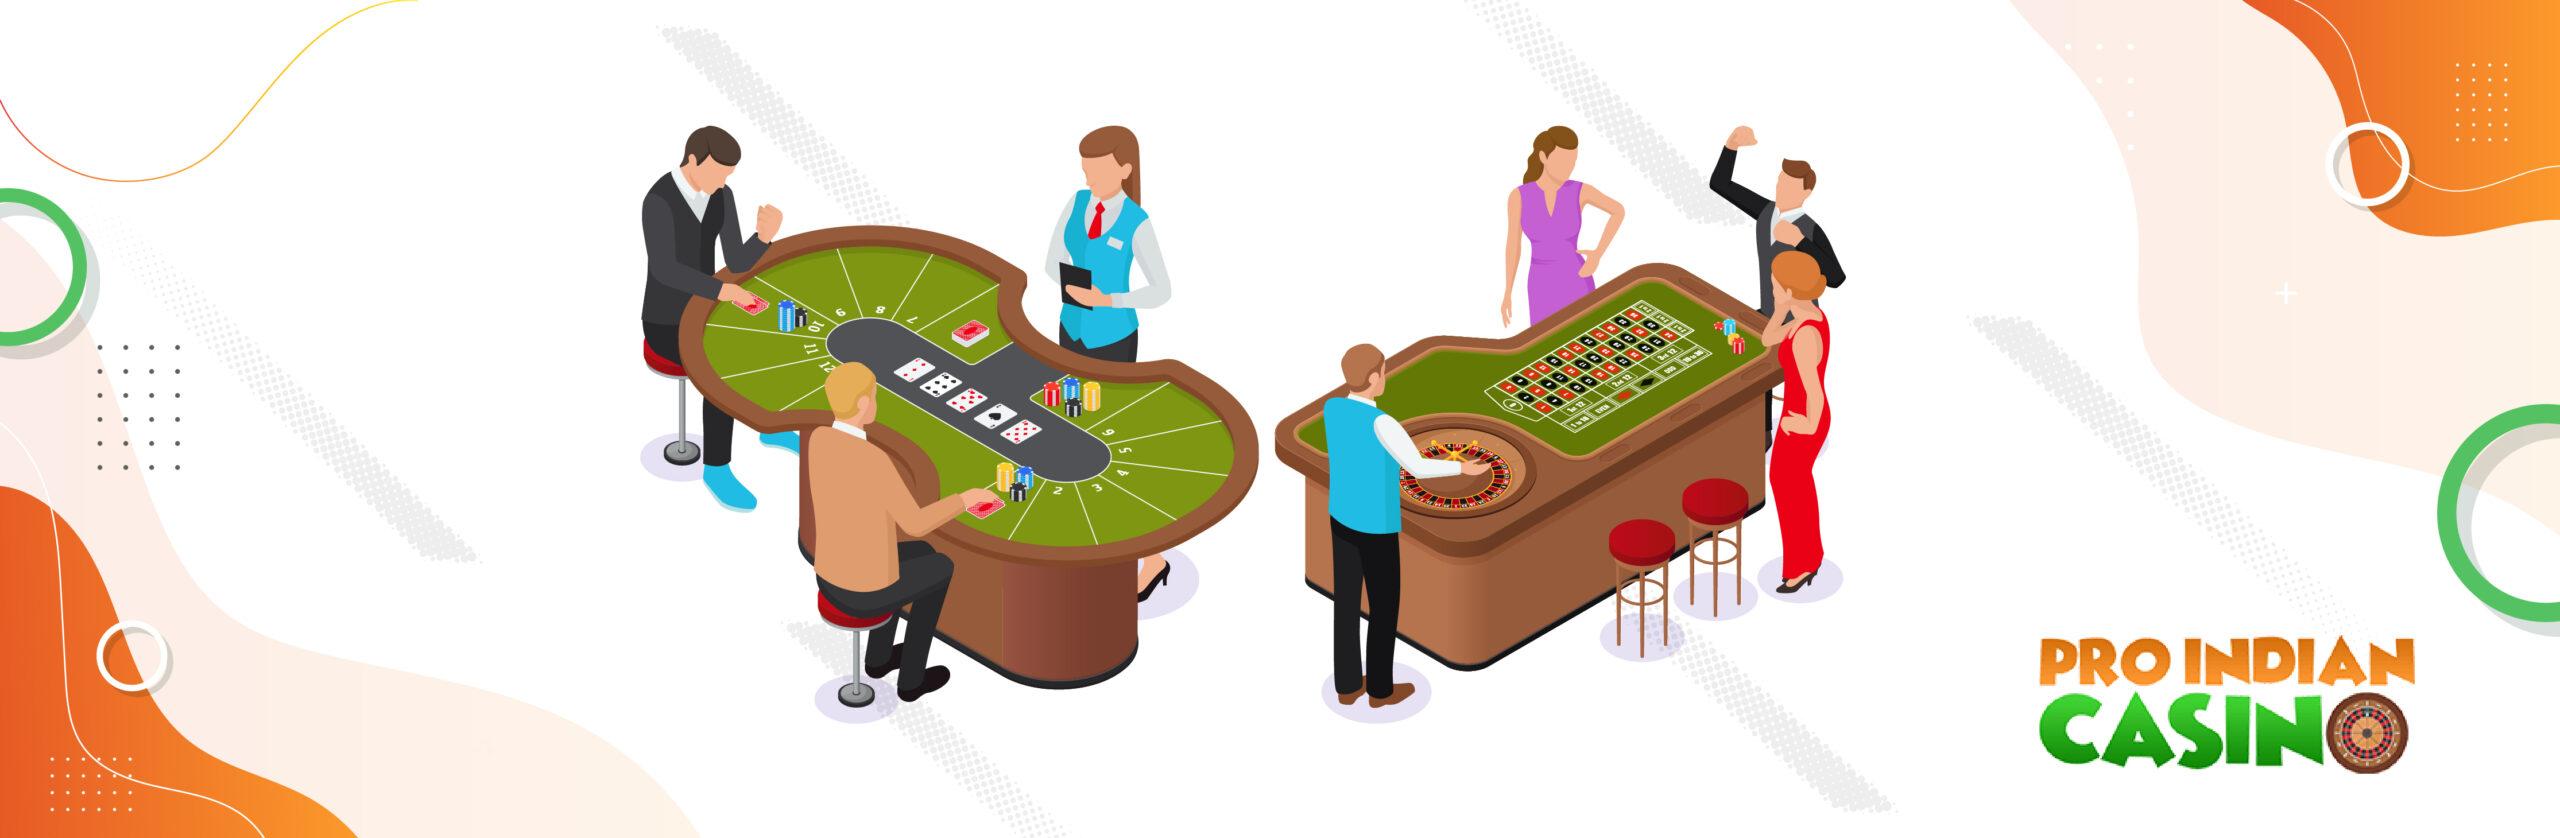 online live casinos india